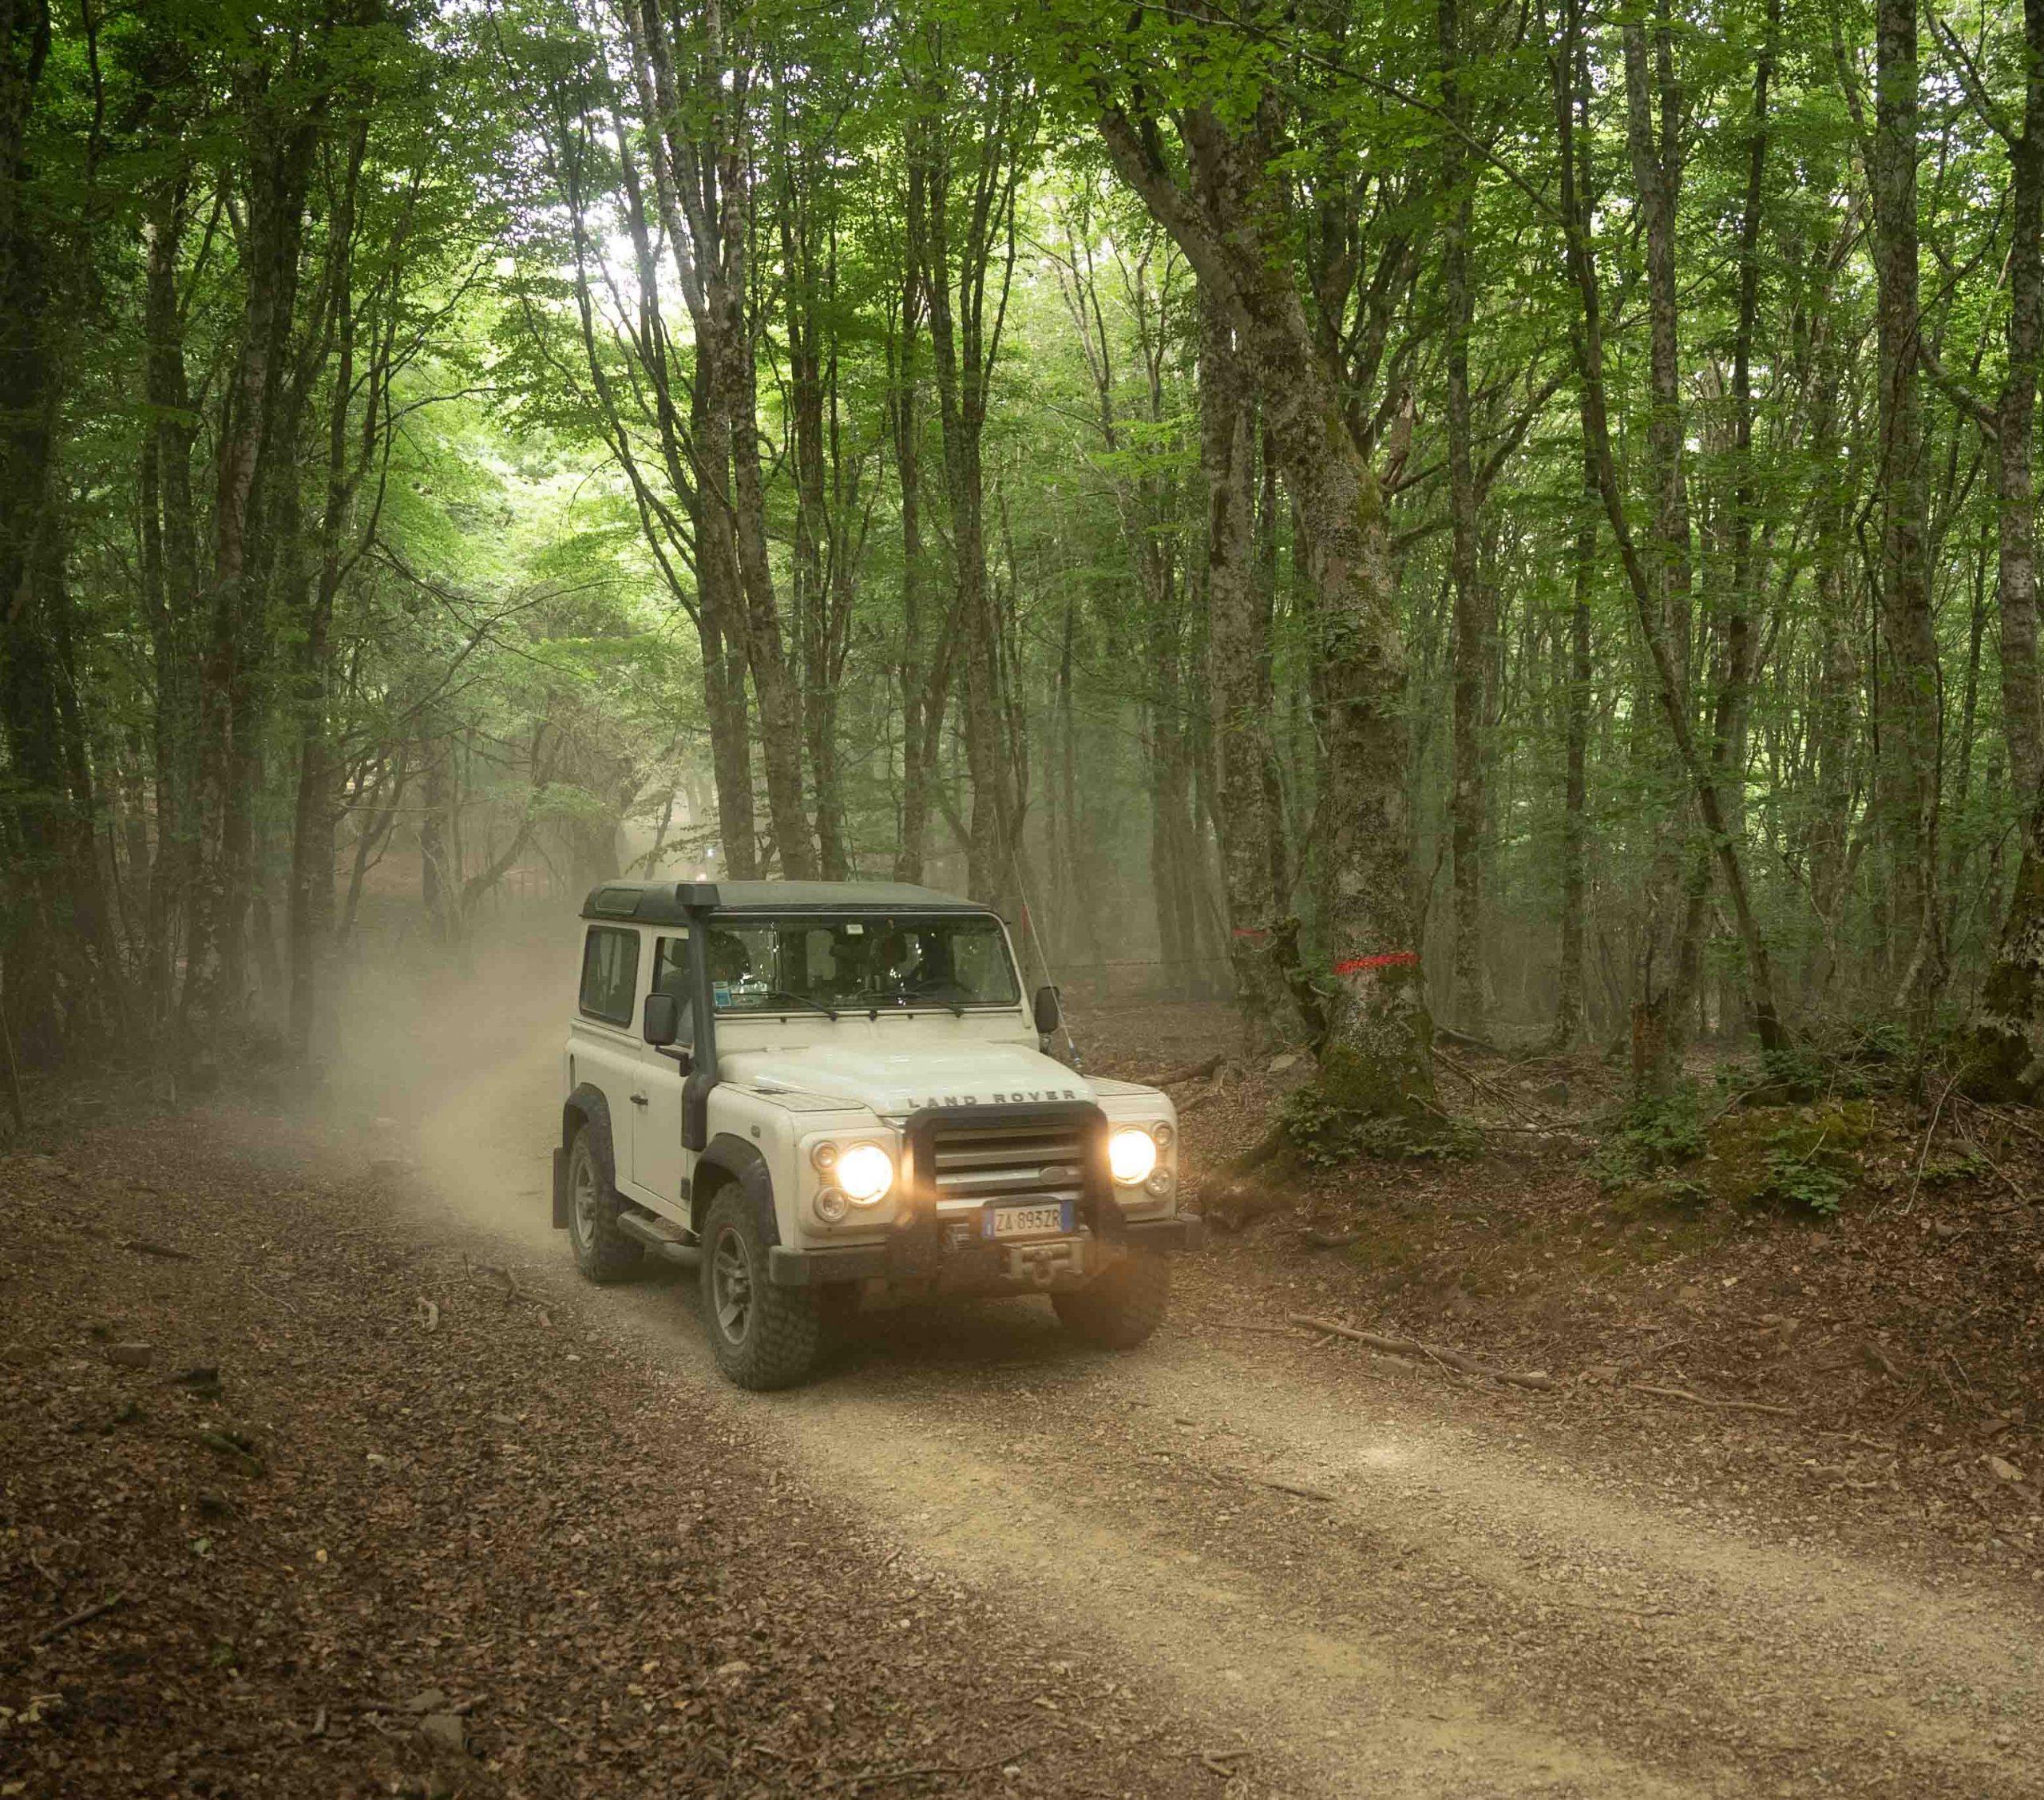 Land_Rover_Tour_Sicilia_2021_Land_Rover_Experience_Italia_-60